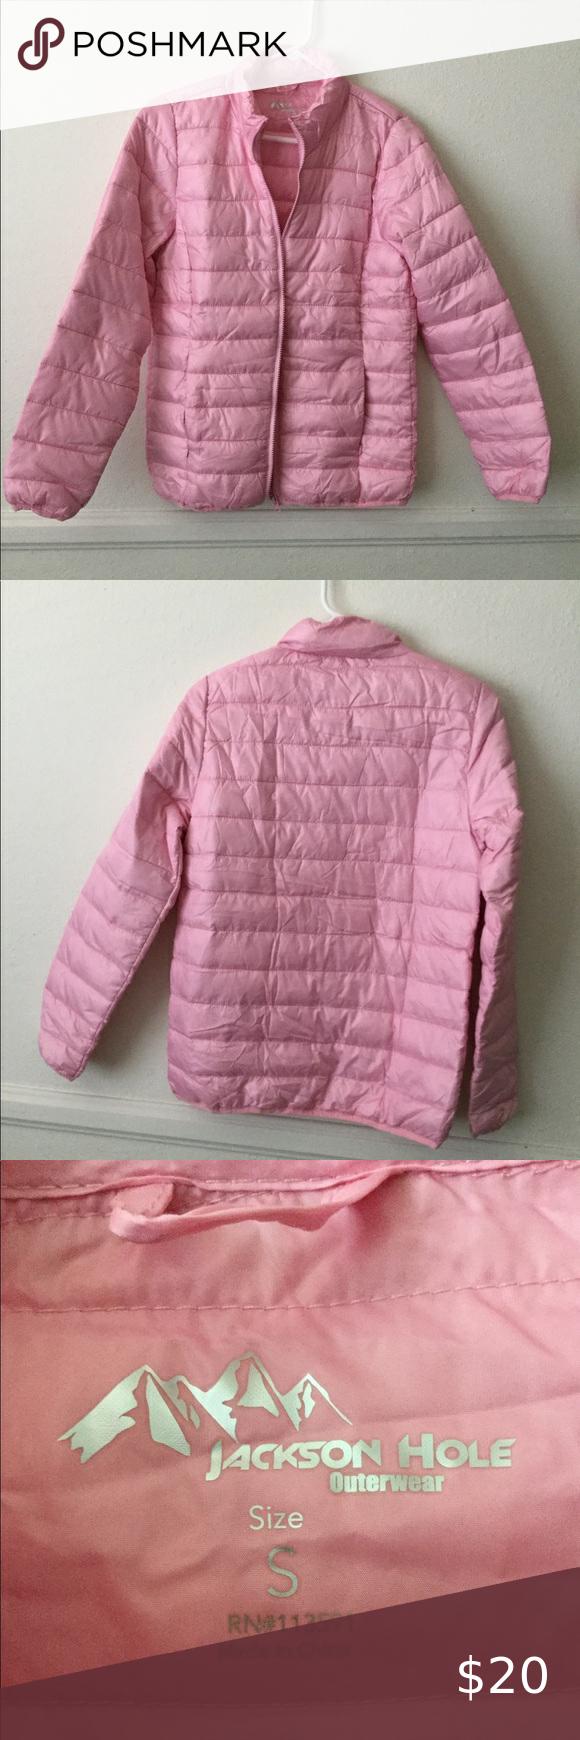 Jackson Hole Pink Puffer Jacket Pink Puffer Jacket Jackson Hole Puffer Jackets [ 1740 x 580 Pixel ]